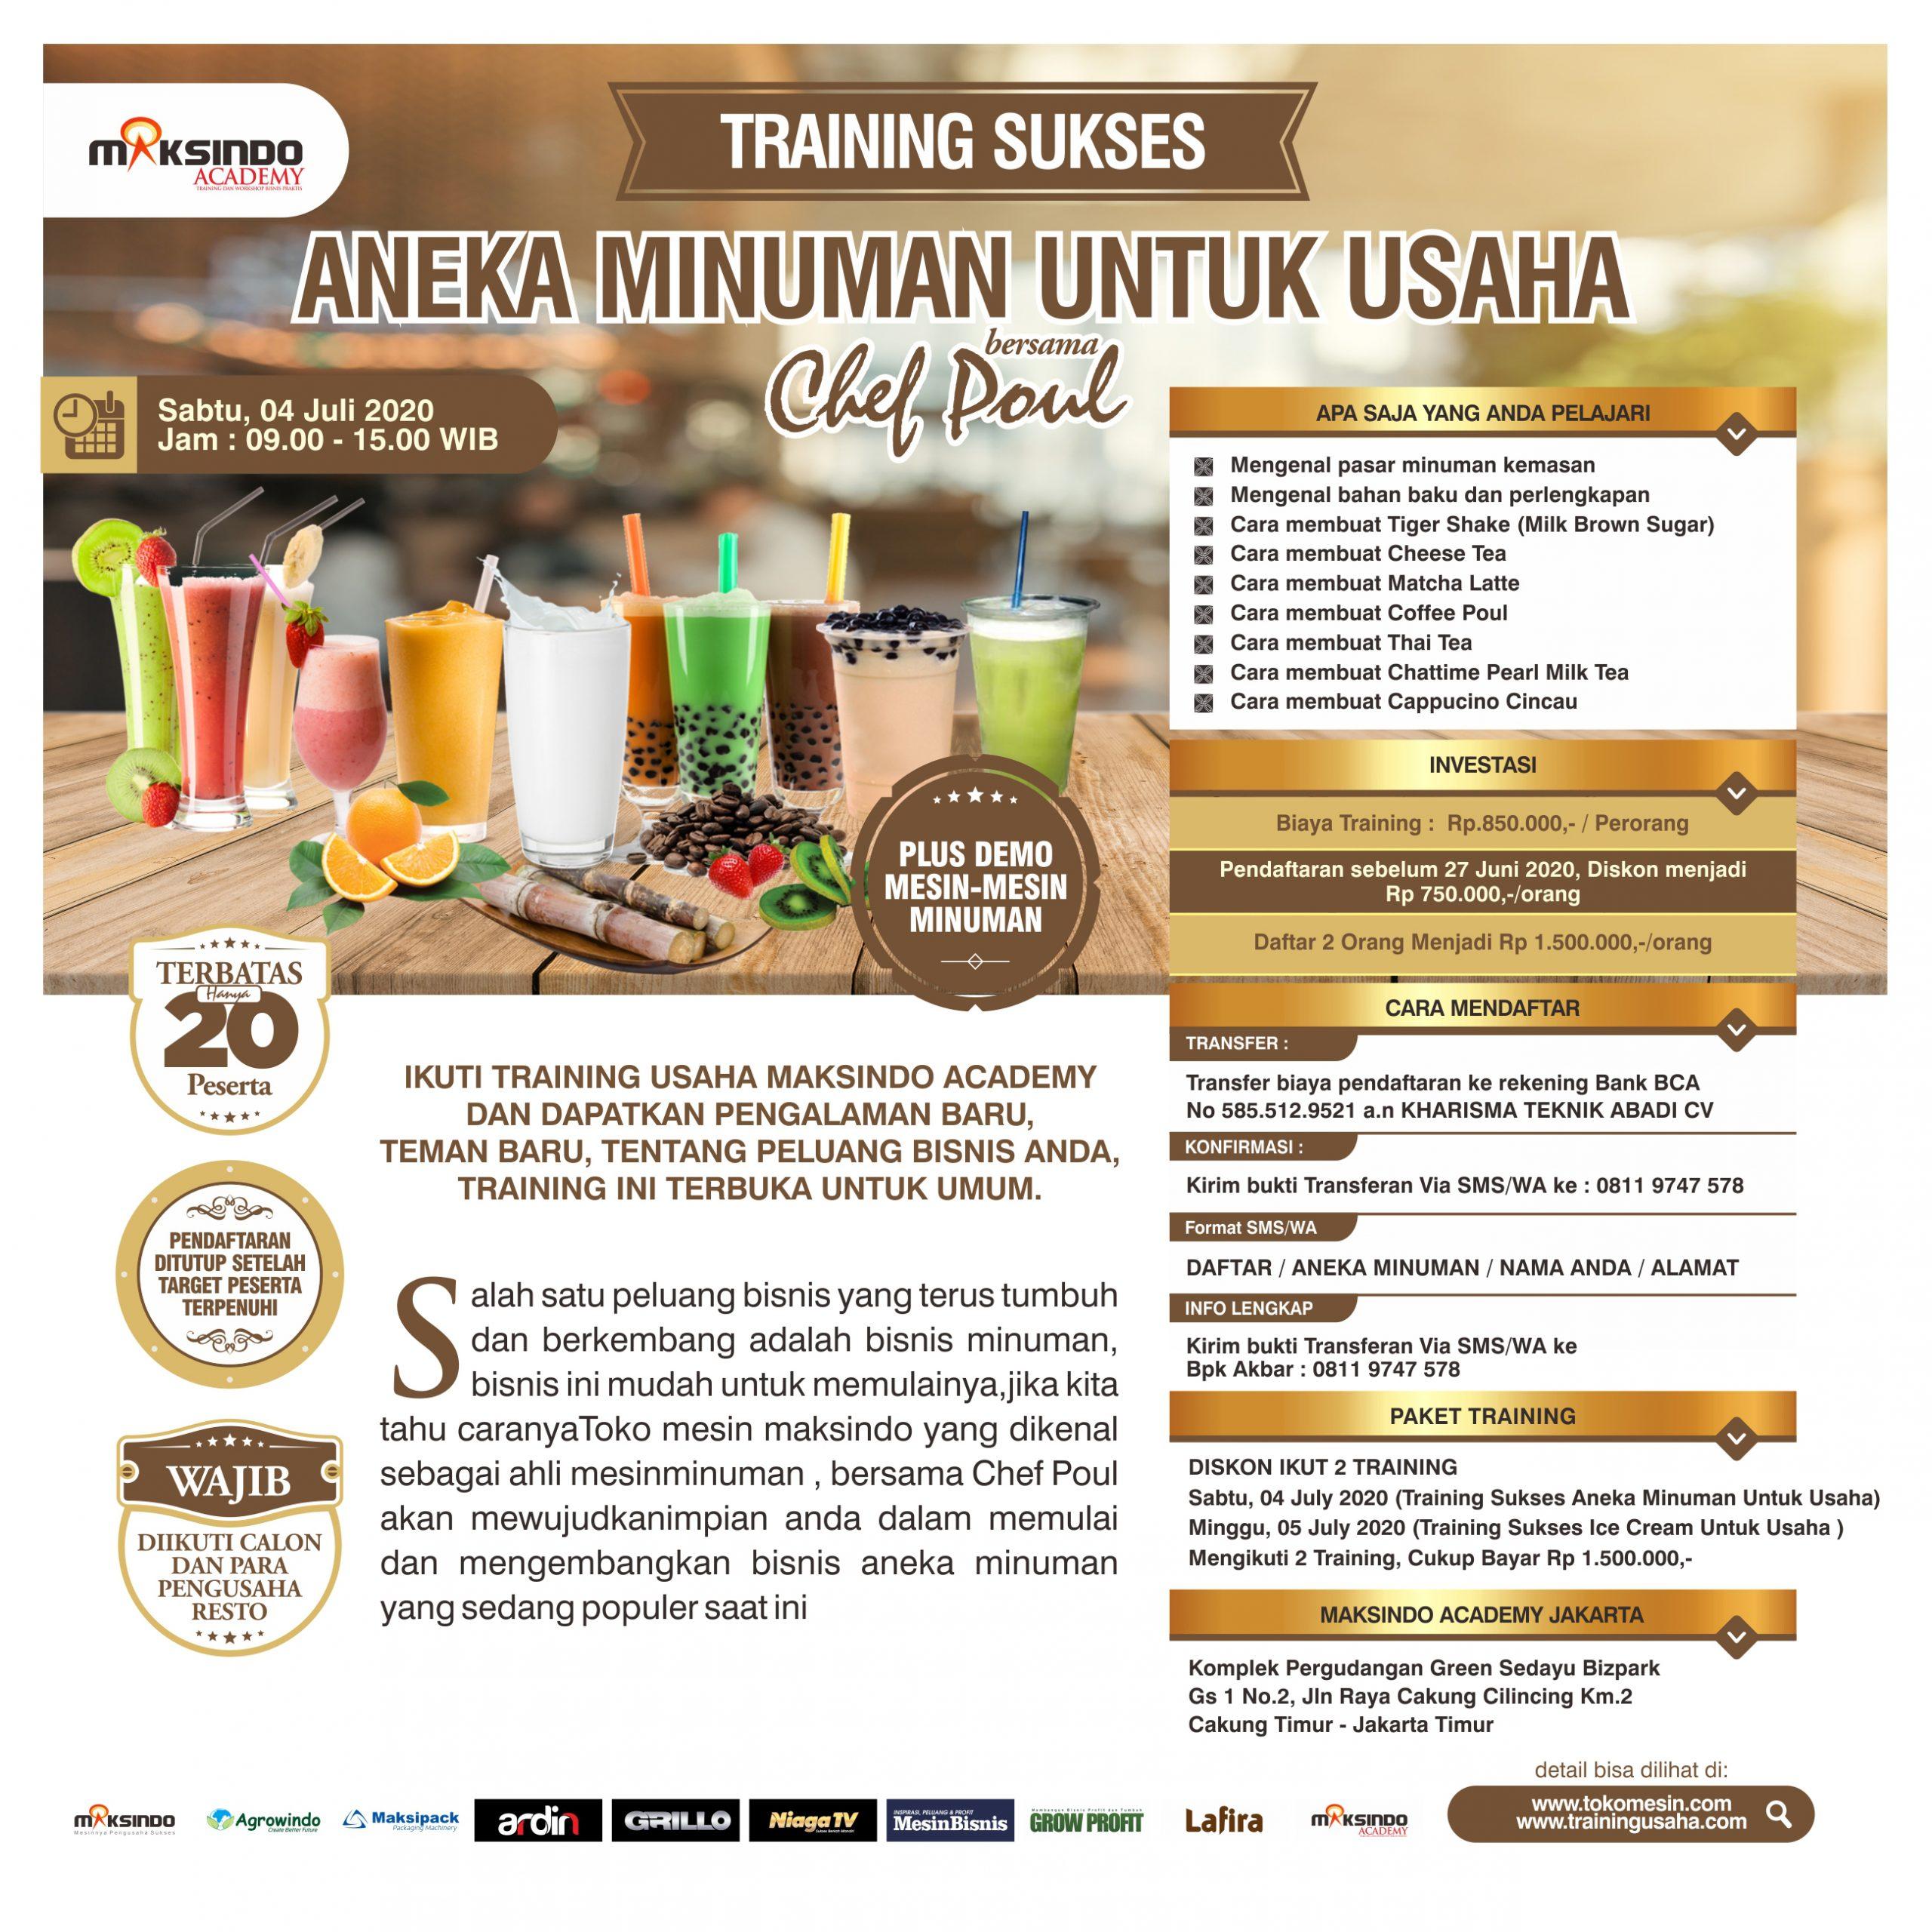 Training Sukses Aneka Minuman Untuk Usaha Sabtu, 04 July 2020